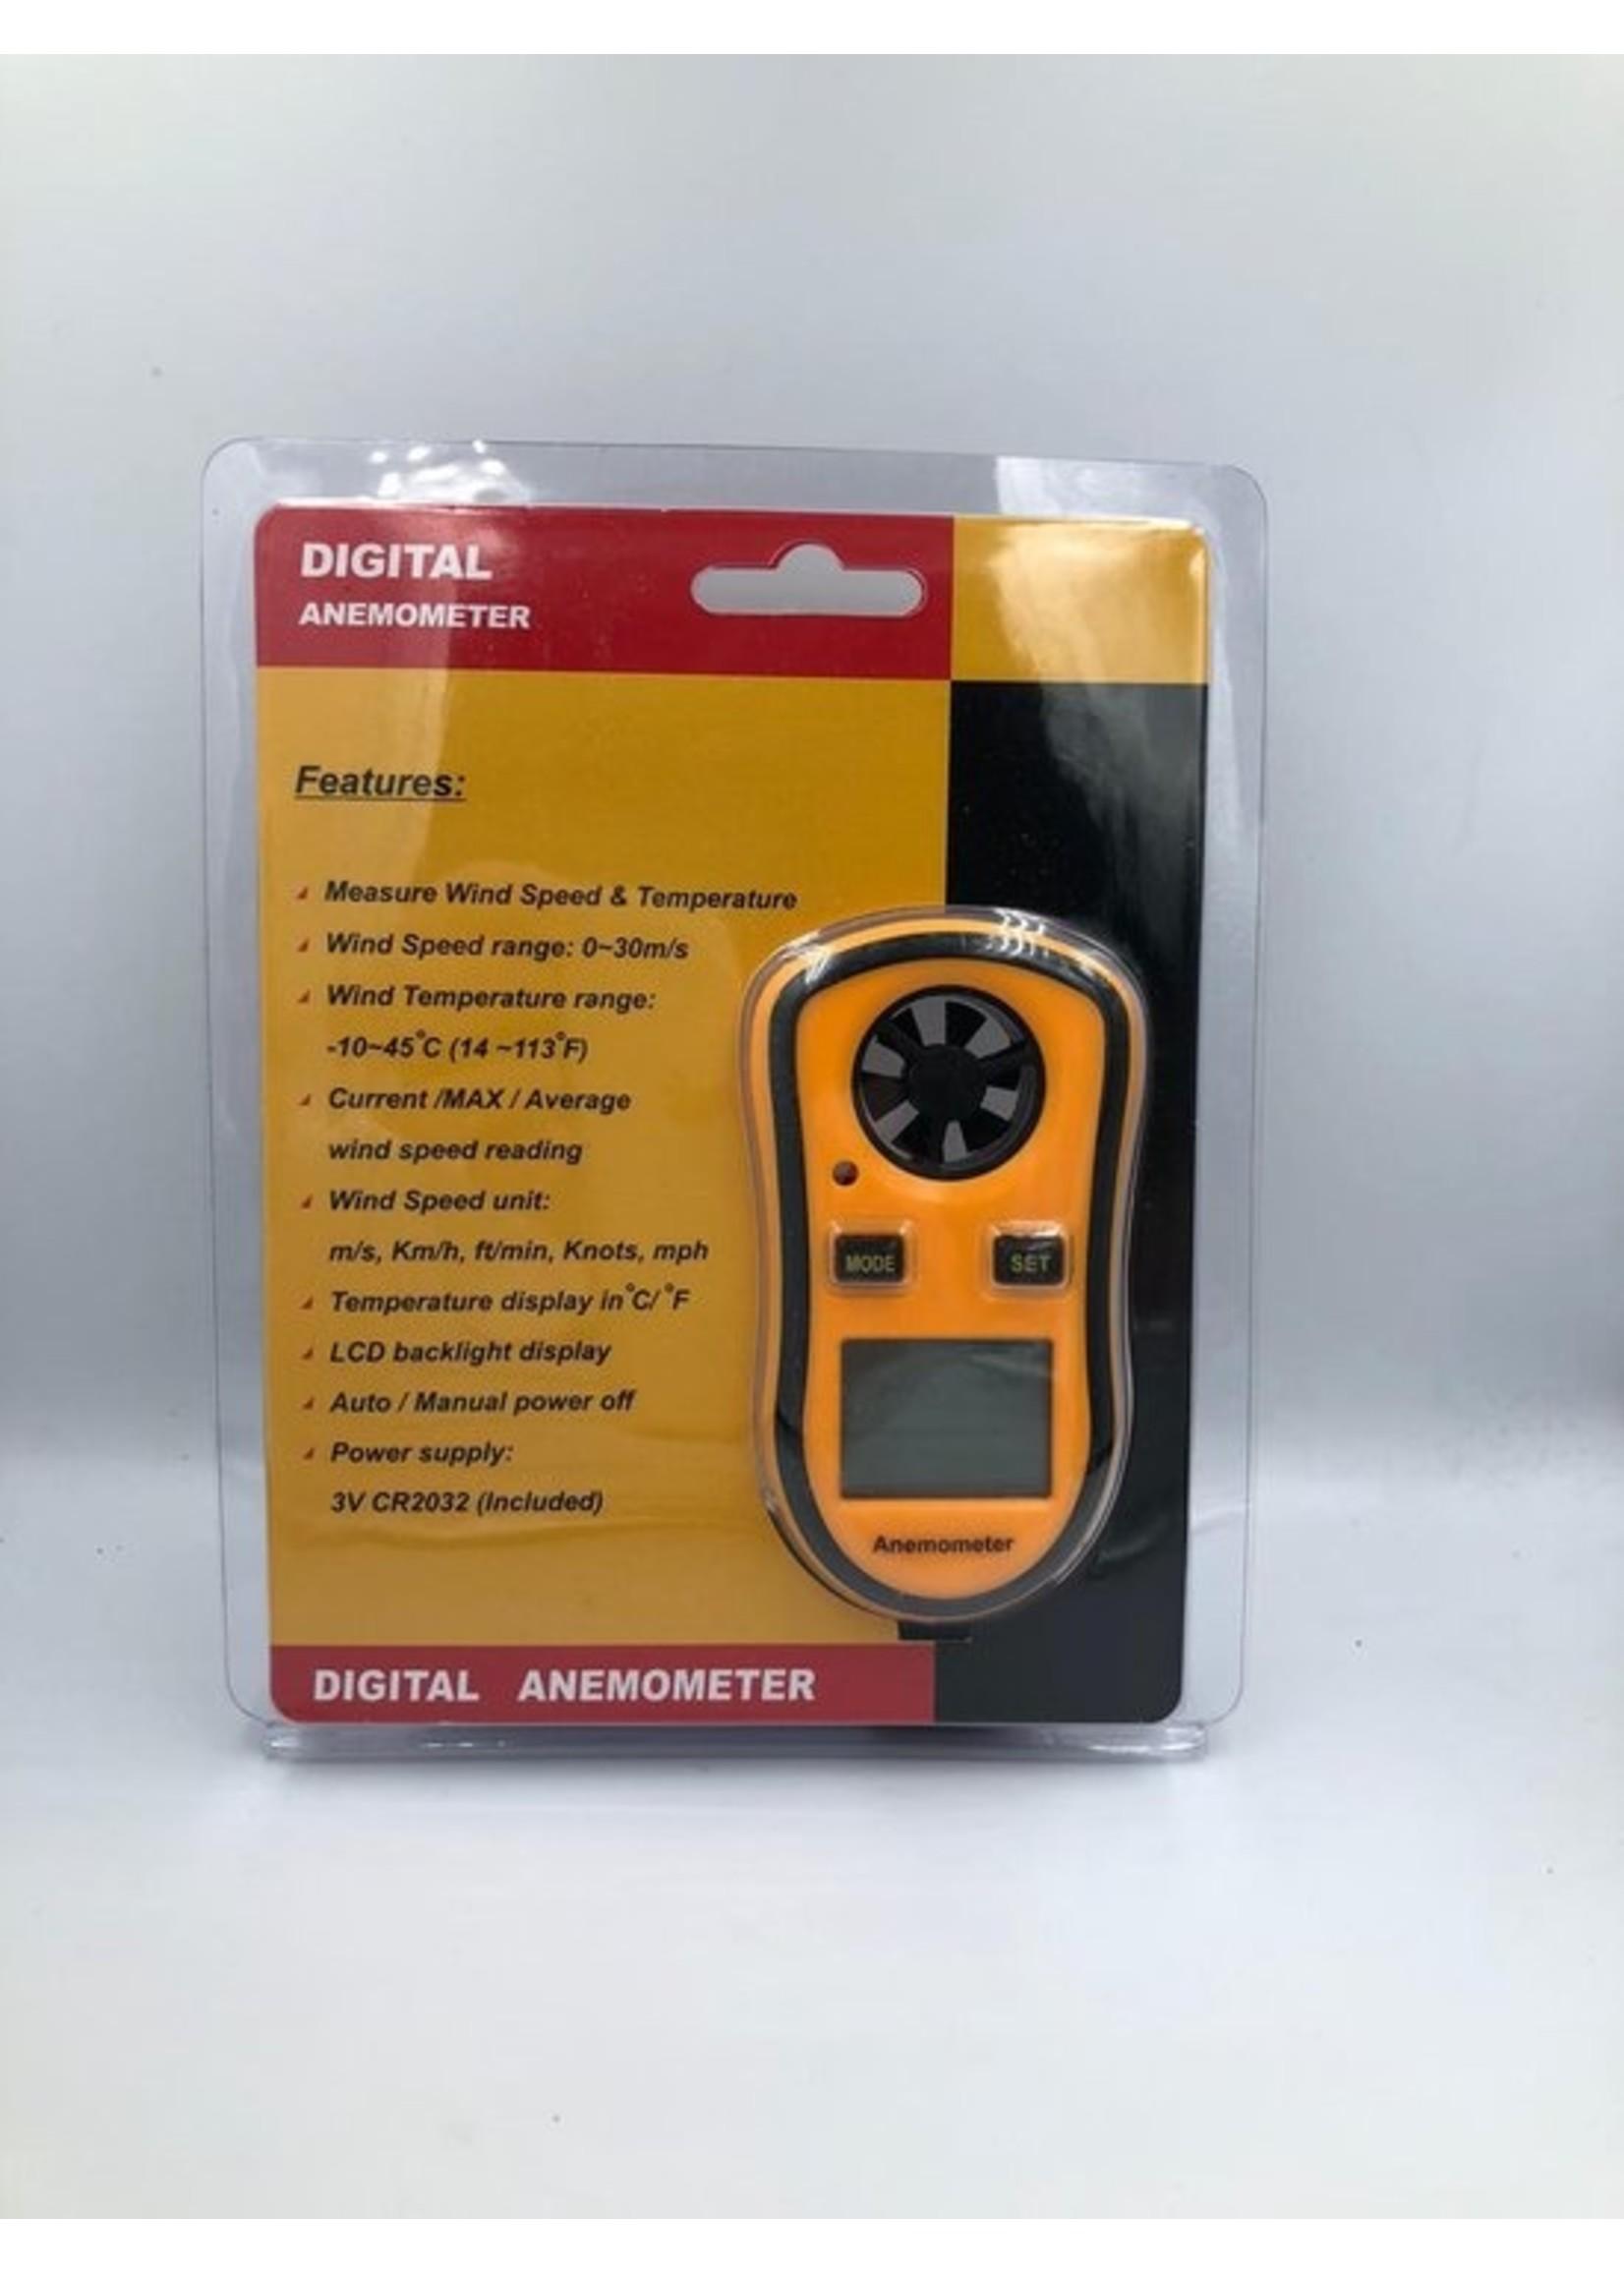 Spider Digitale Anemometer Windsnelheids meter met ingebouwde thermometer